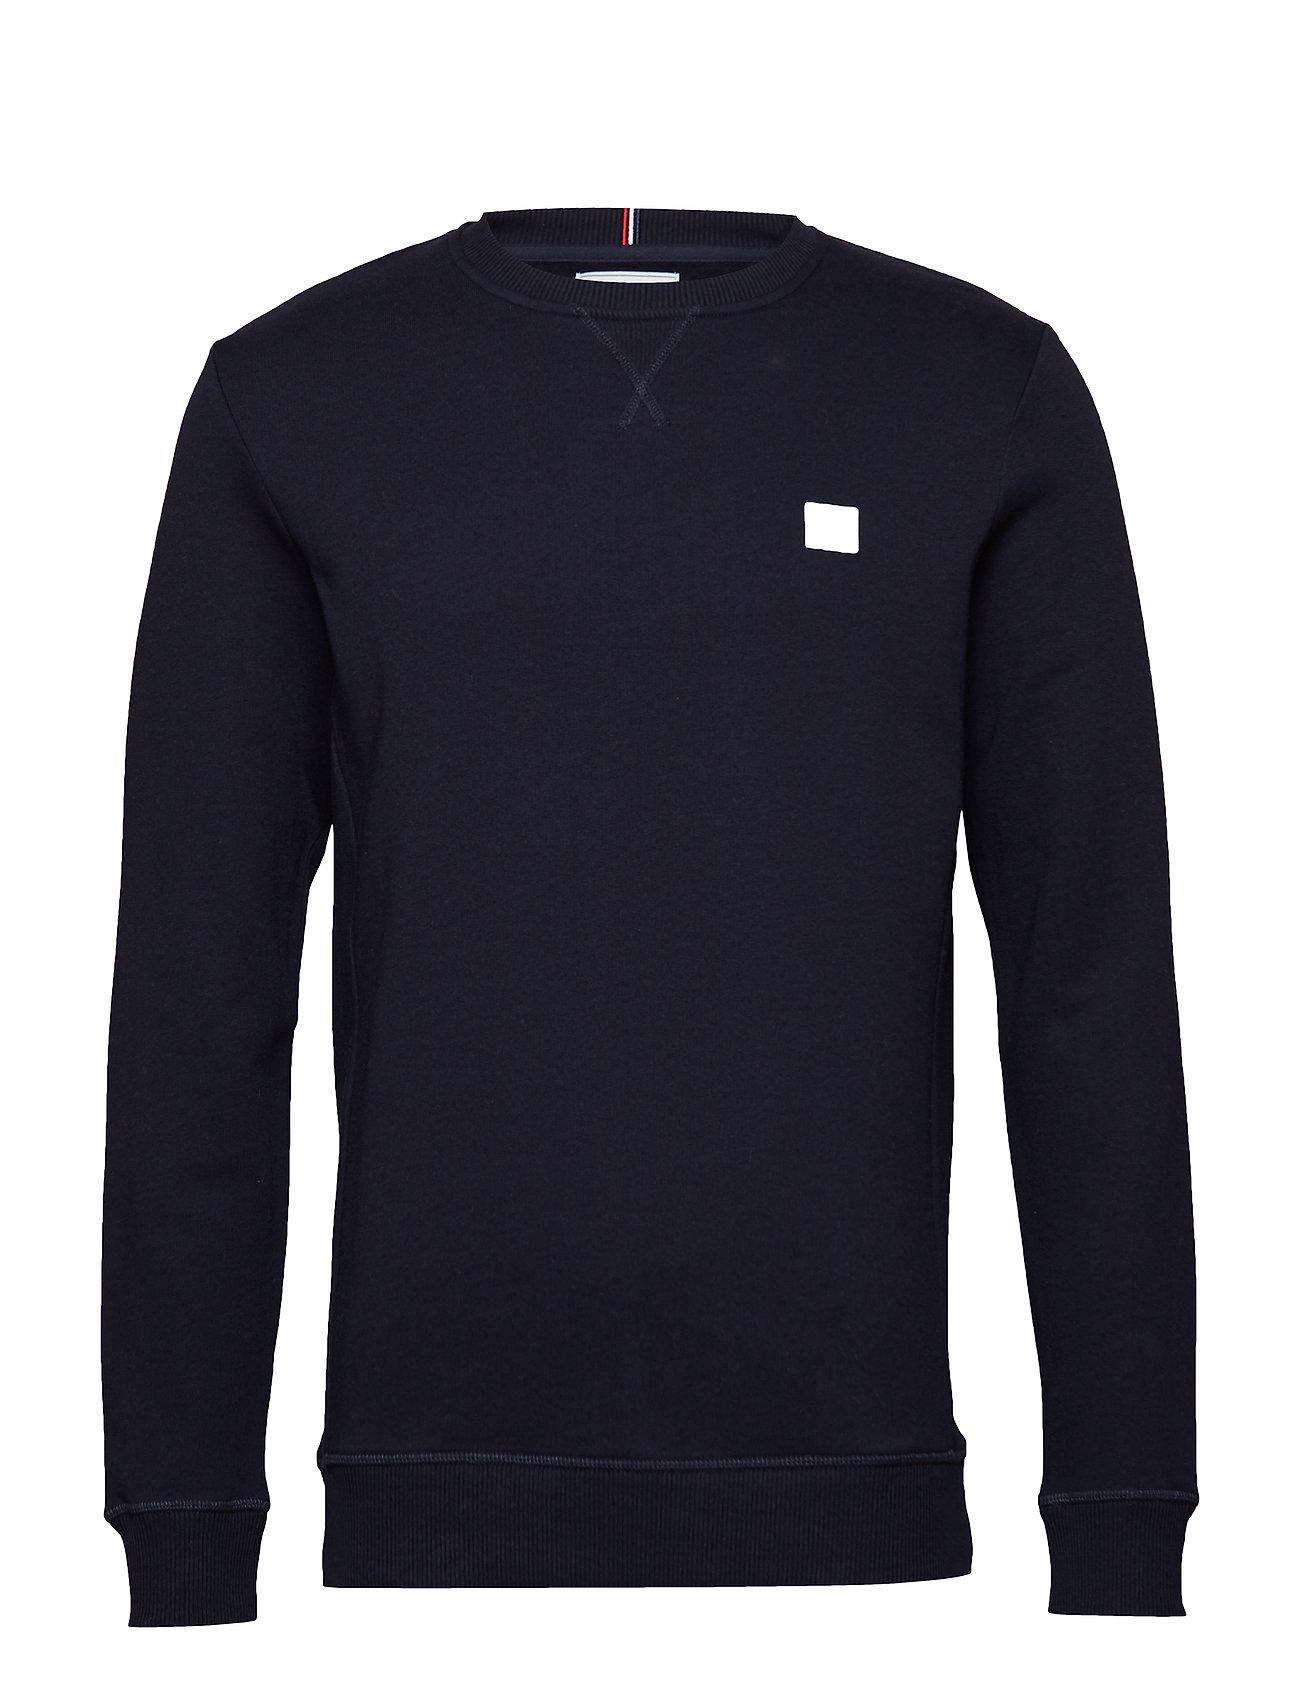 Image of Piece Sweatshirt Langærmet Trøje Blå LES DEUX (3122946707)